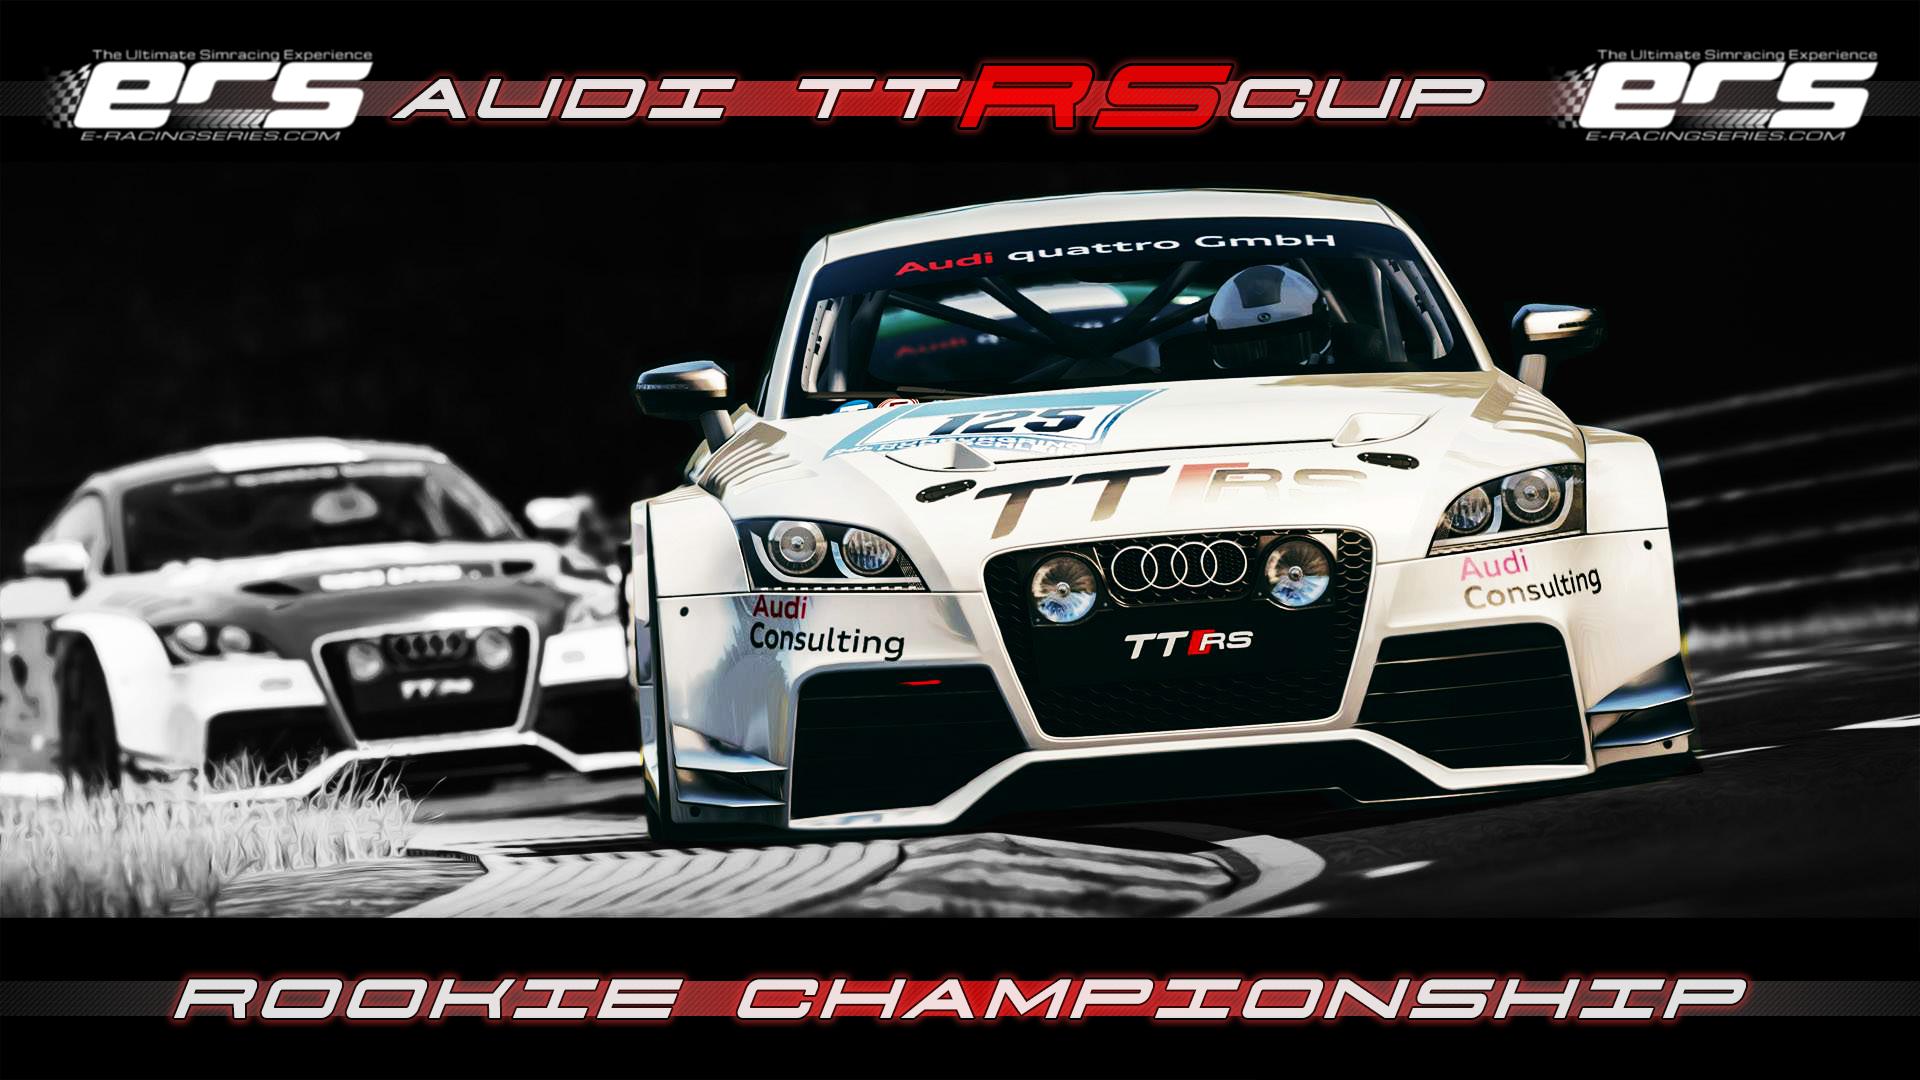 Audi TT RS CUP – Rookie Championship